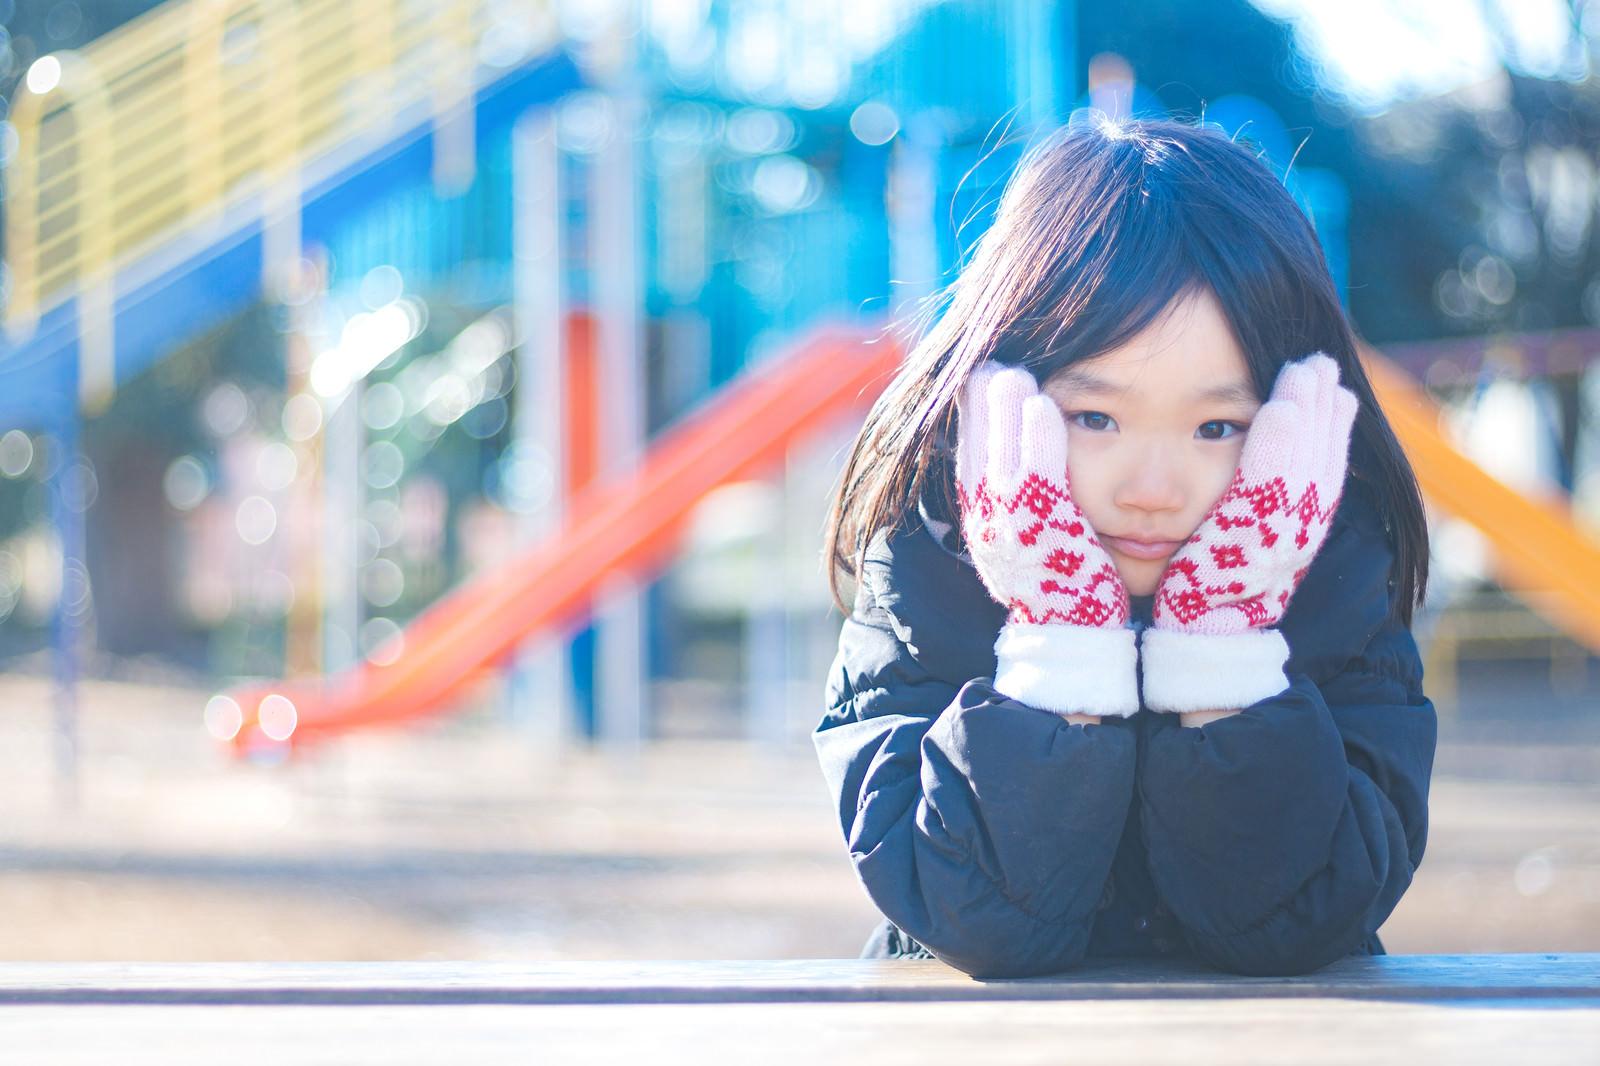 AnjyuIMG 7739 TP V cold anju